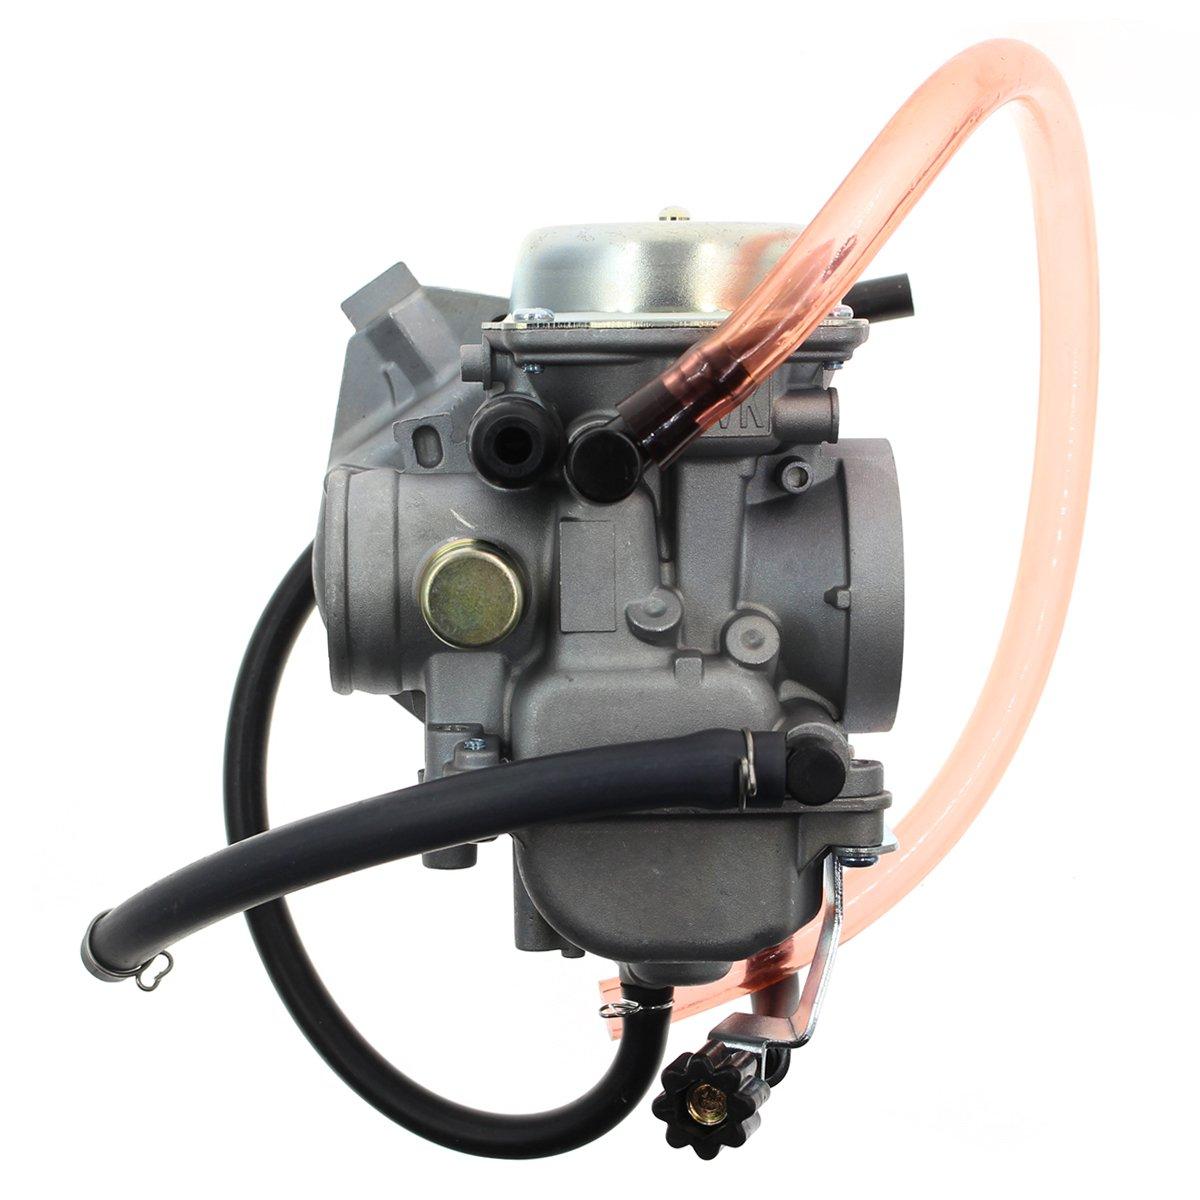 Goodeal Carburetor Carb For 015004 0041 Kawasaki Kvf360 2003 360 Engine Diagram Prairie 2x4 08 09 4x4 02 12 Automotive